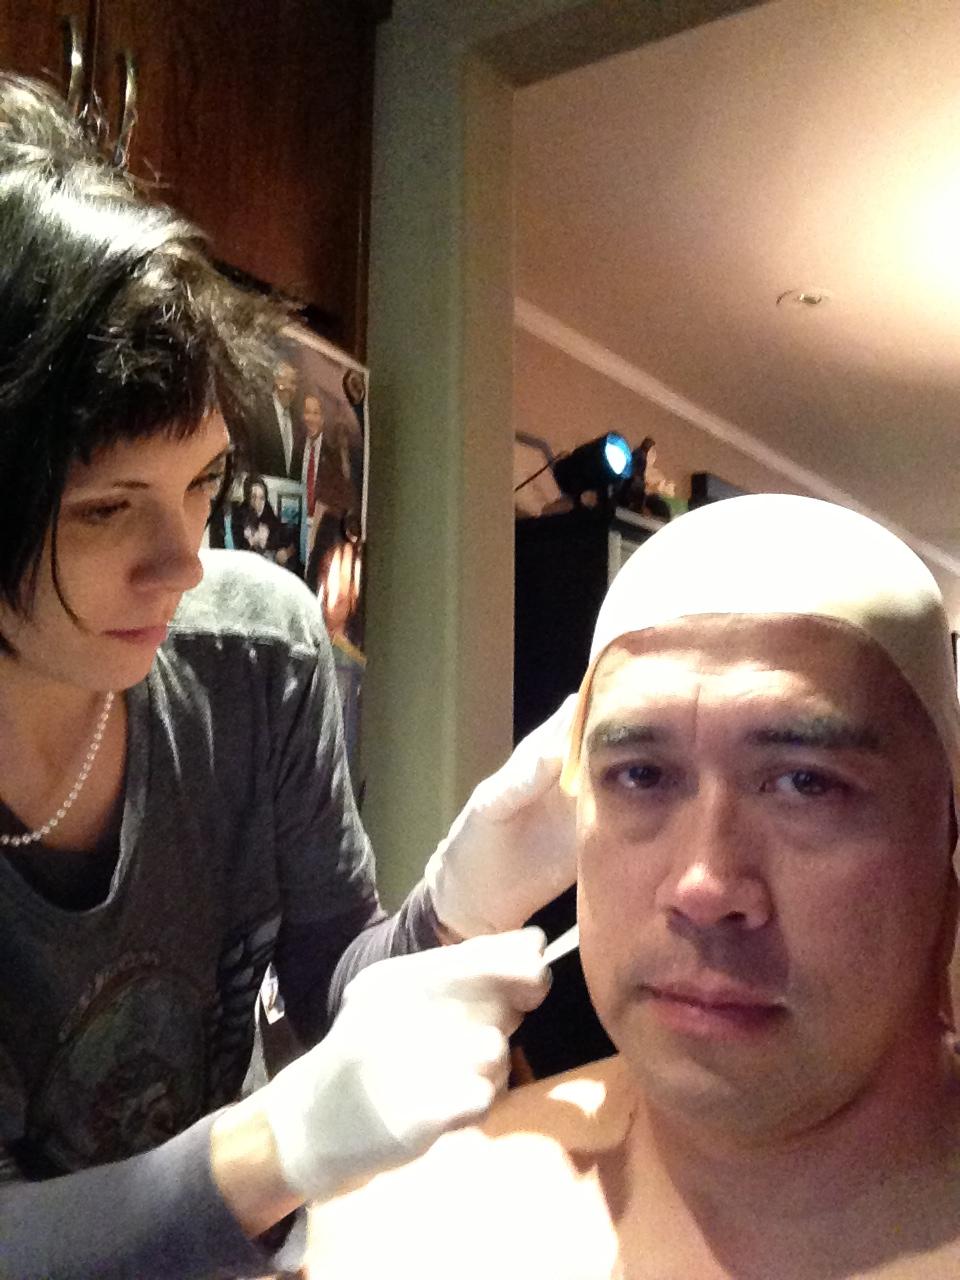 Lead Makeup FX Artist Laney Chantal applying Richard Dorton's Head mold